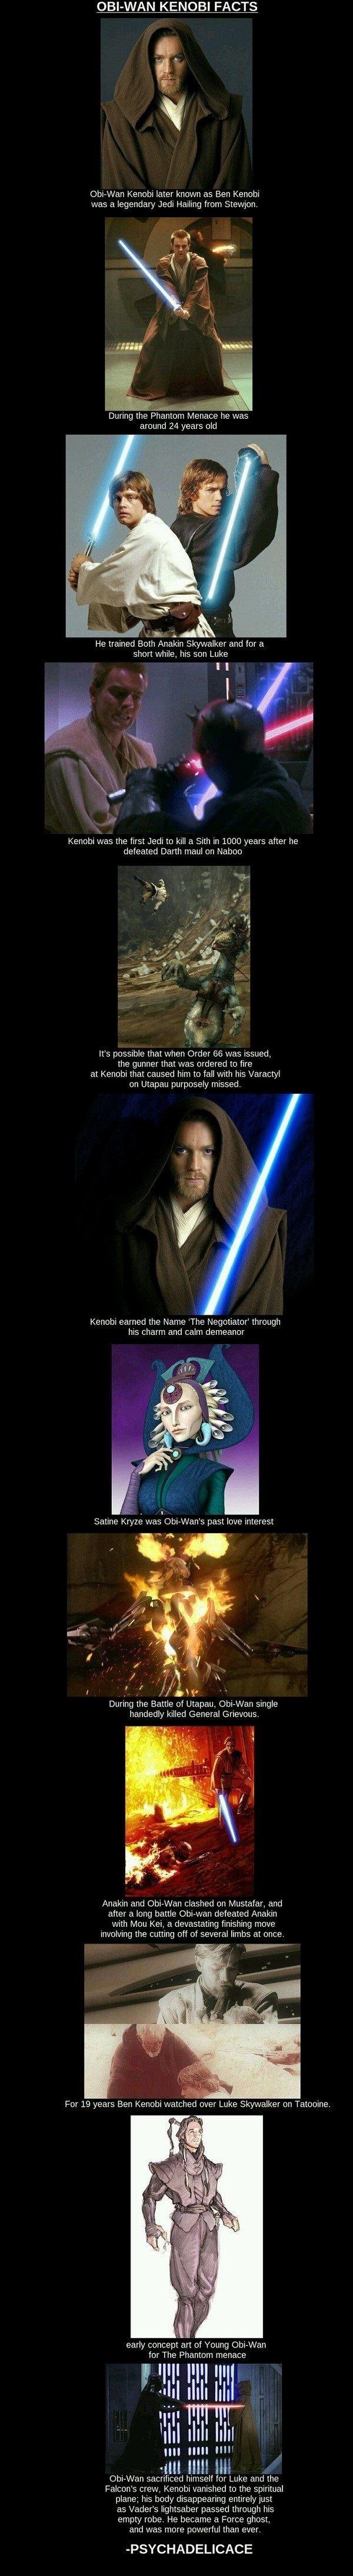 Obi Wan Kenobi Facts